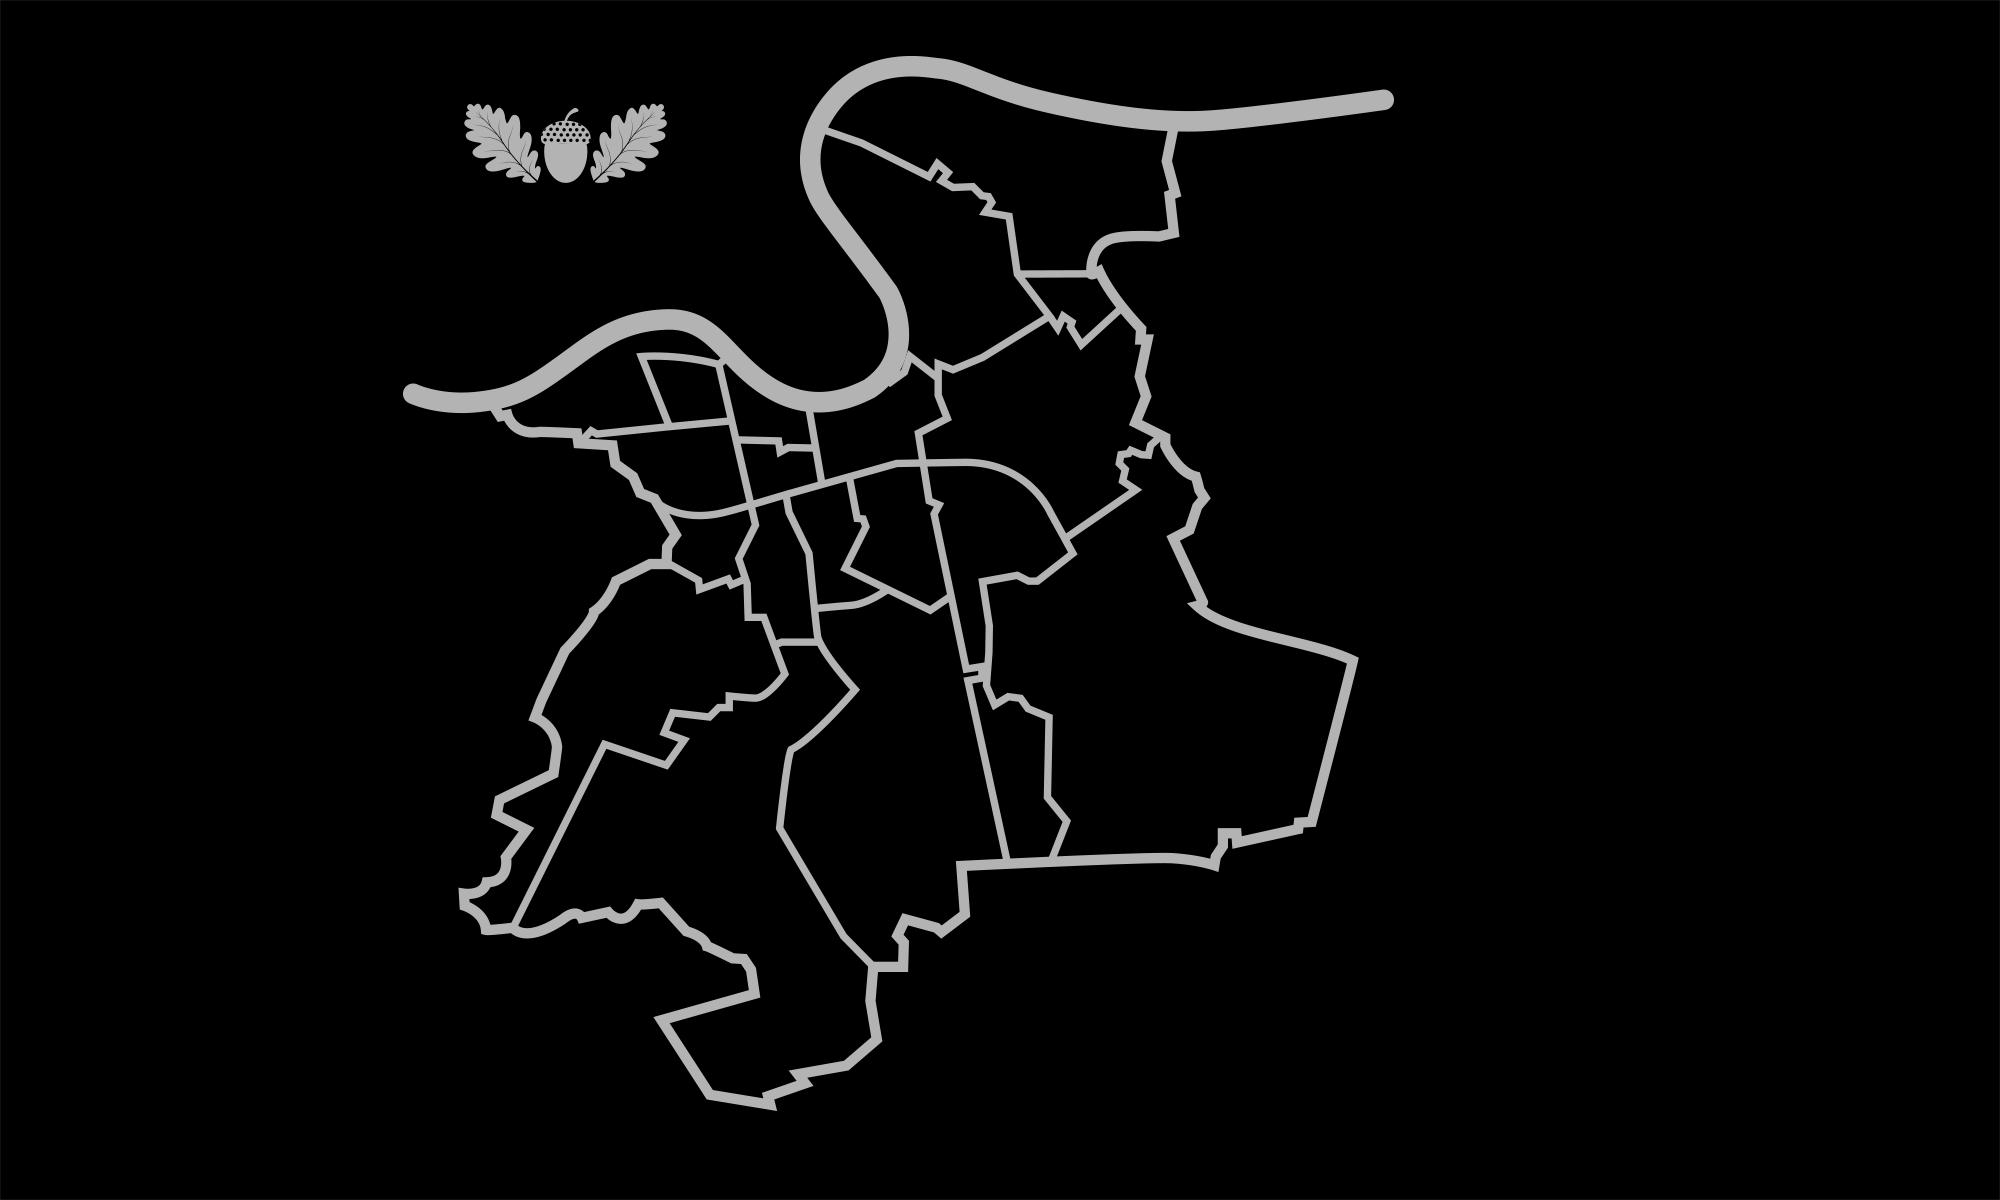 backround map